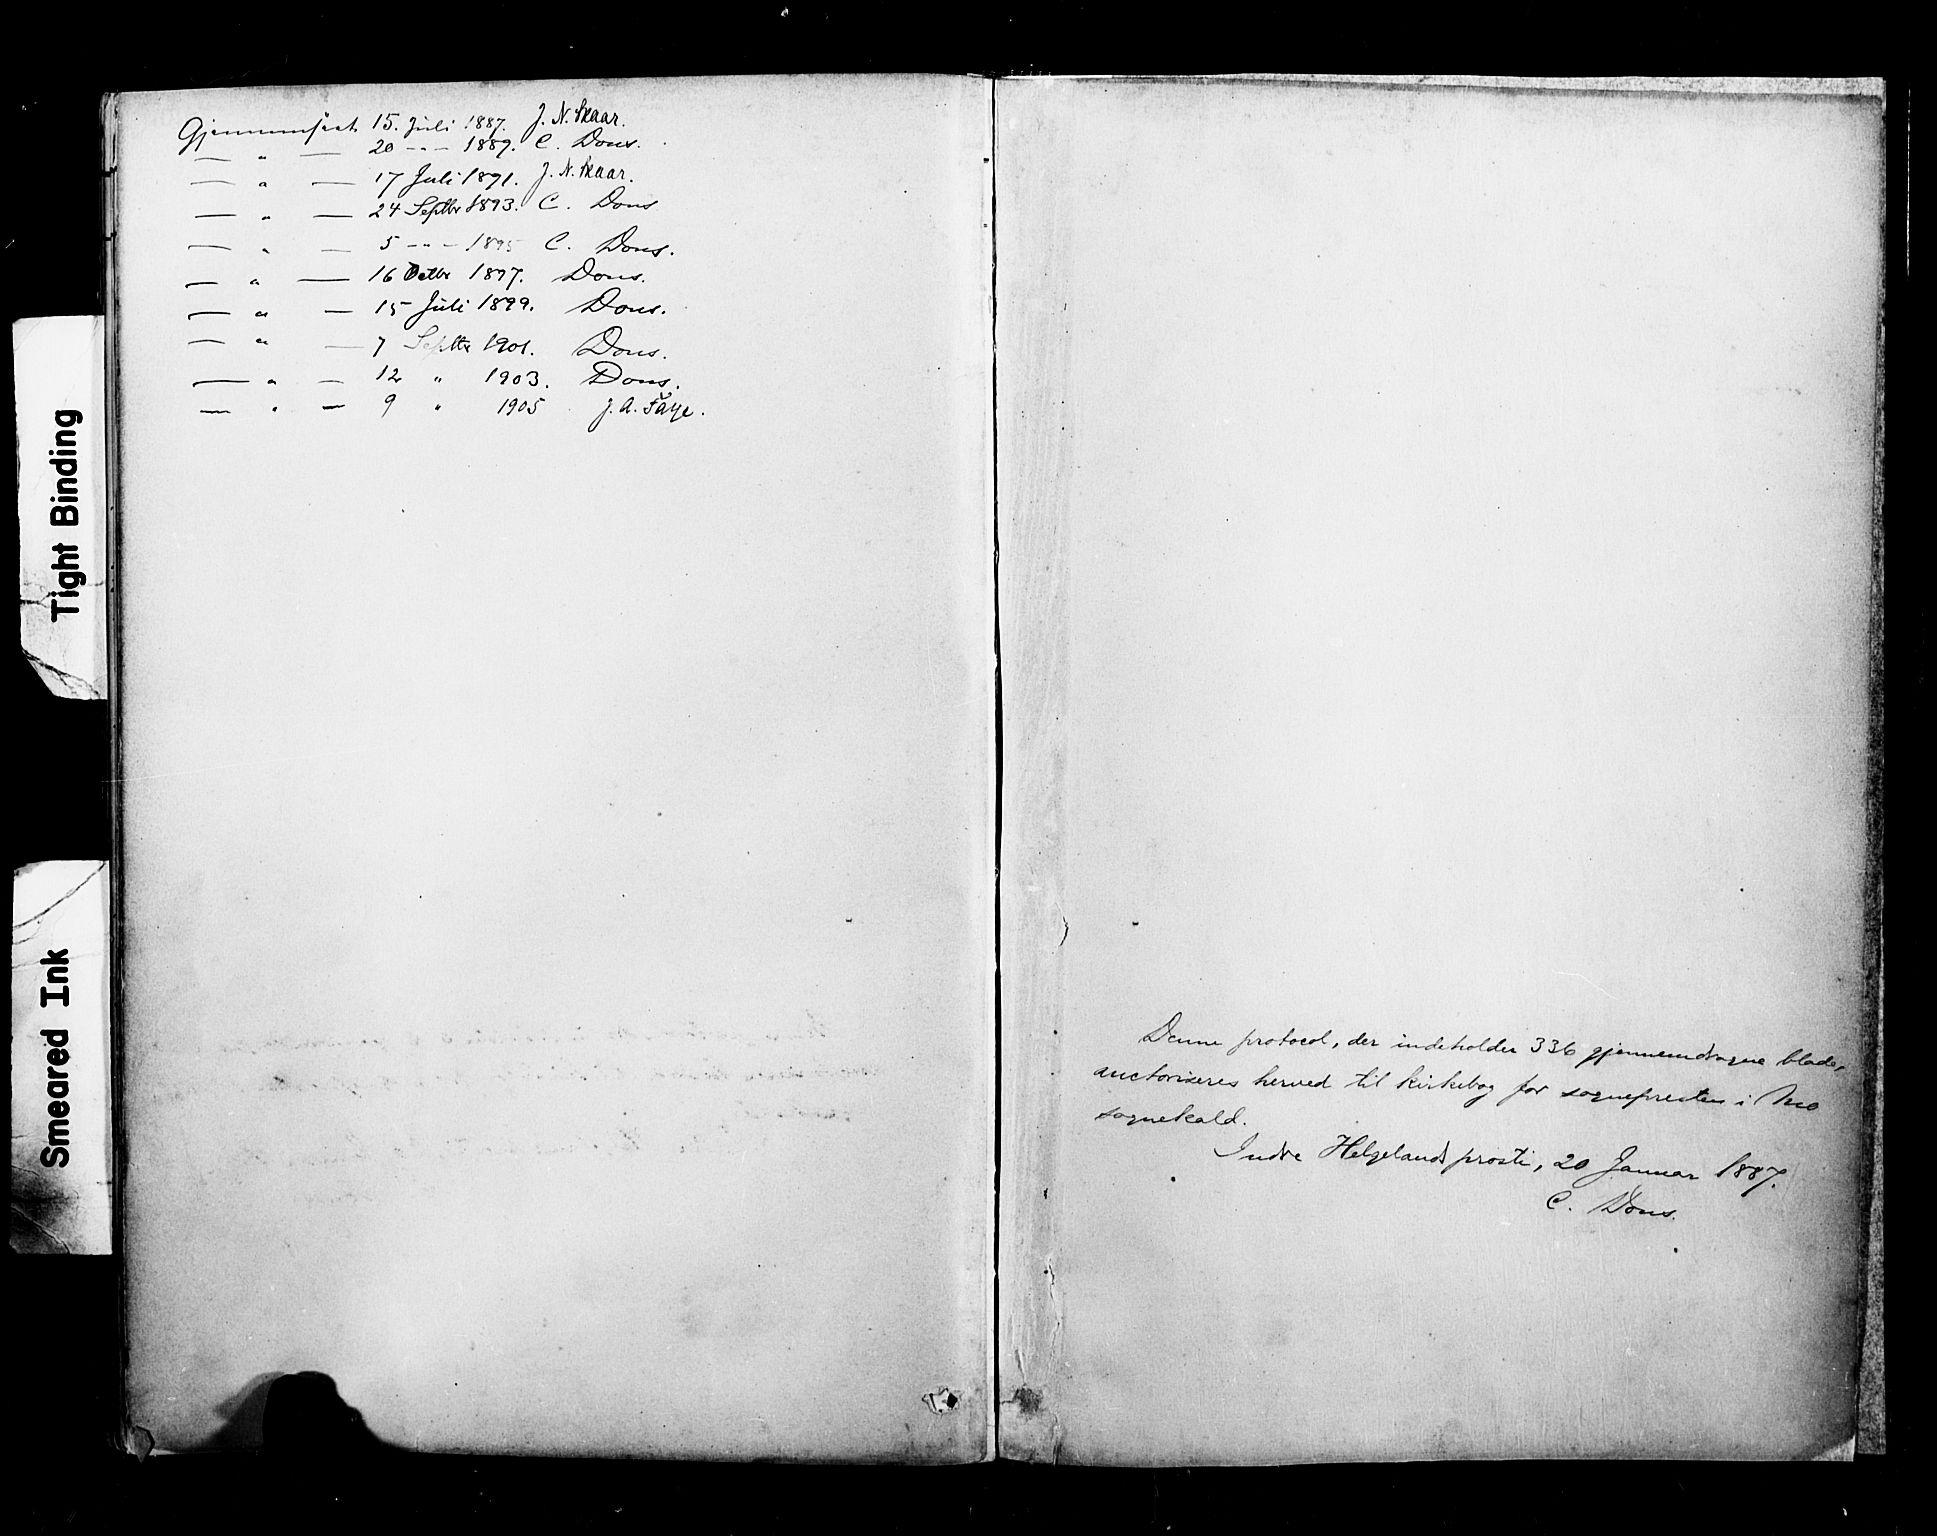 SAT, Ministerialprotokoller, klokkerbøker og fødselsregistre - Nordland, 827/L0401: Ministerialbok nr. 827A13, 1887-1905